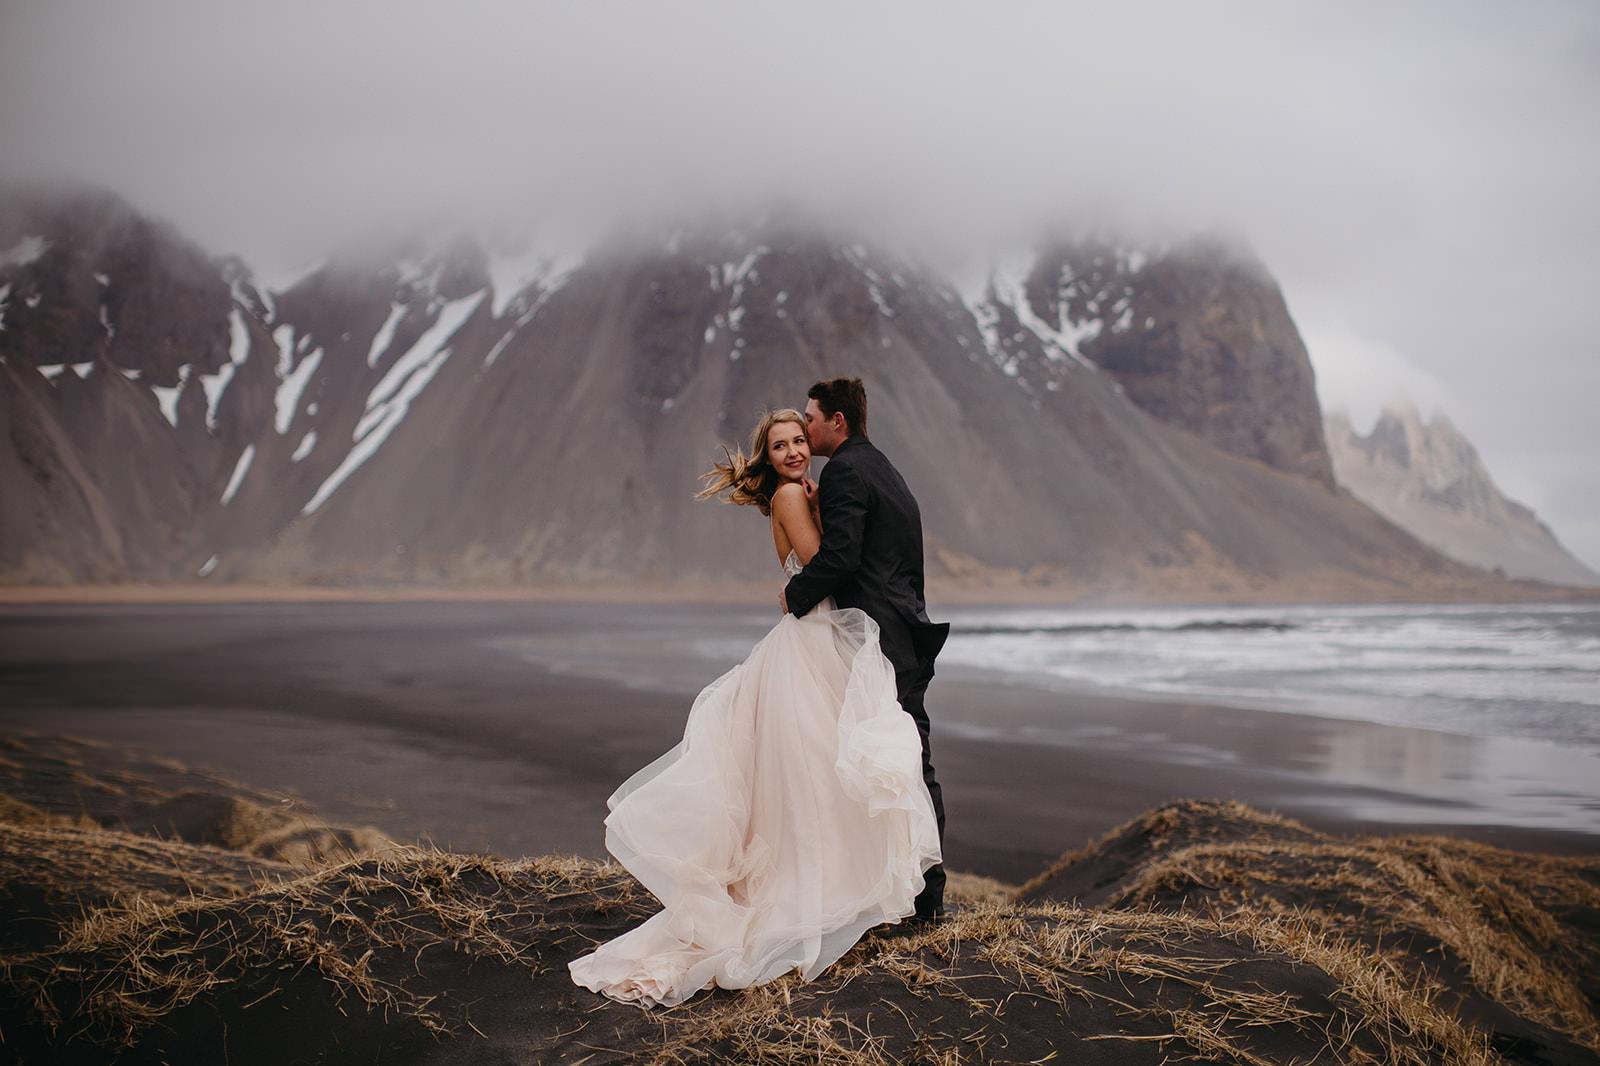 Icelandic Iceland Elopement Wedding Elope Photographer Eloping Reykjavík Vik Black Sand Beach Jökulsárlón Skogafoss Waterfall Vestrahorn Mountain Liz Osban Photography Destination 33.jpg